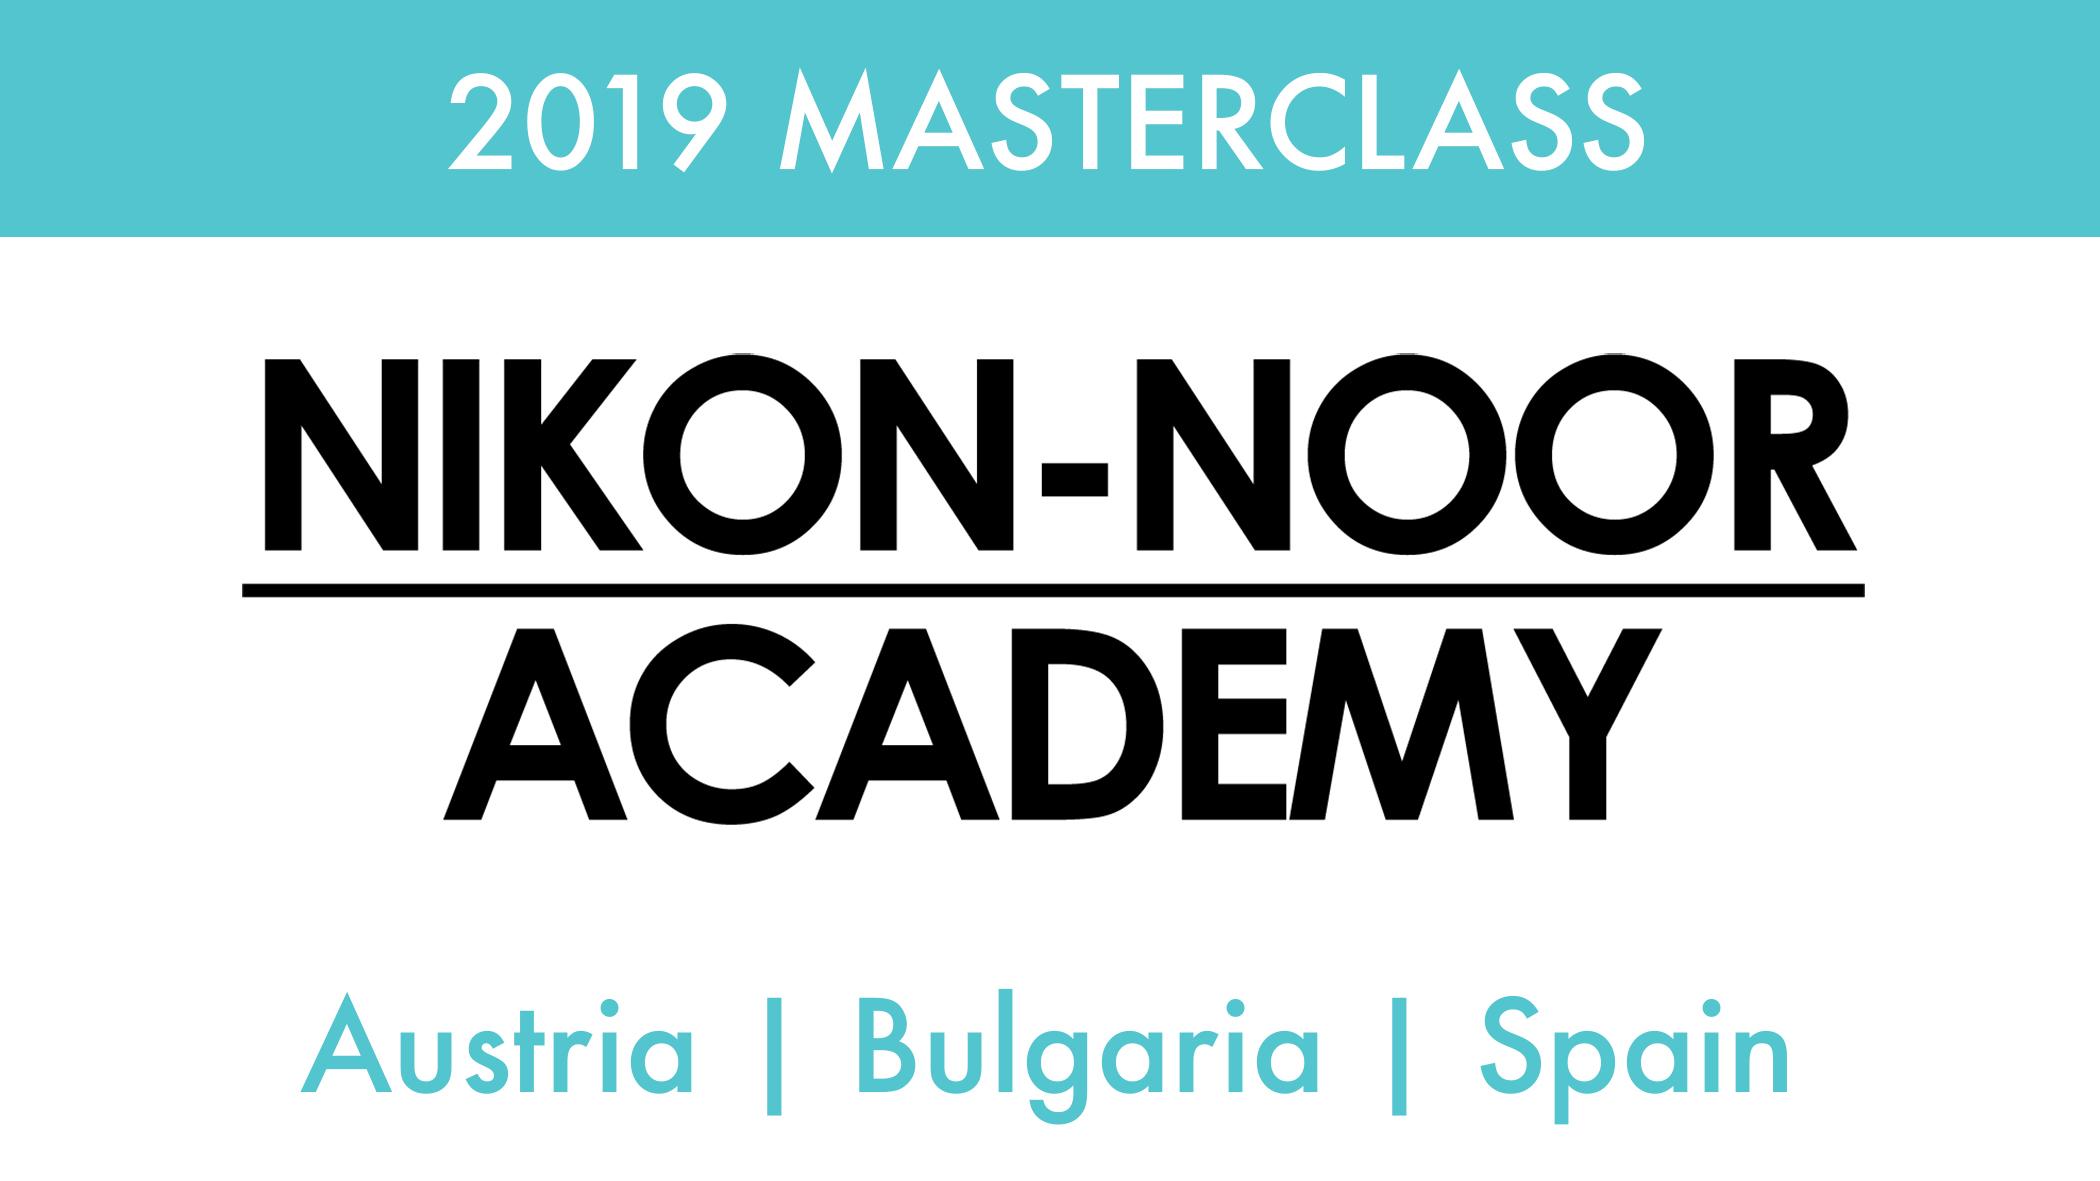 Nikon-NOOR Academy 2019.jpg